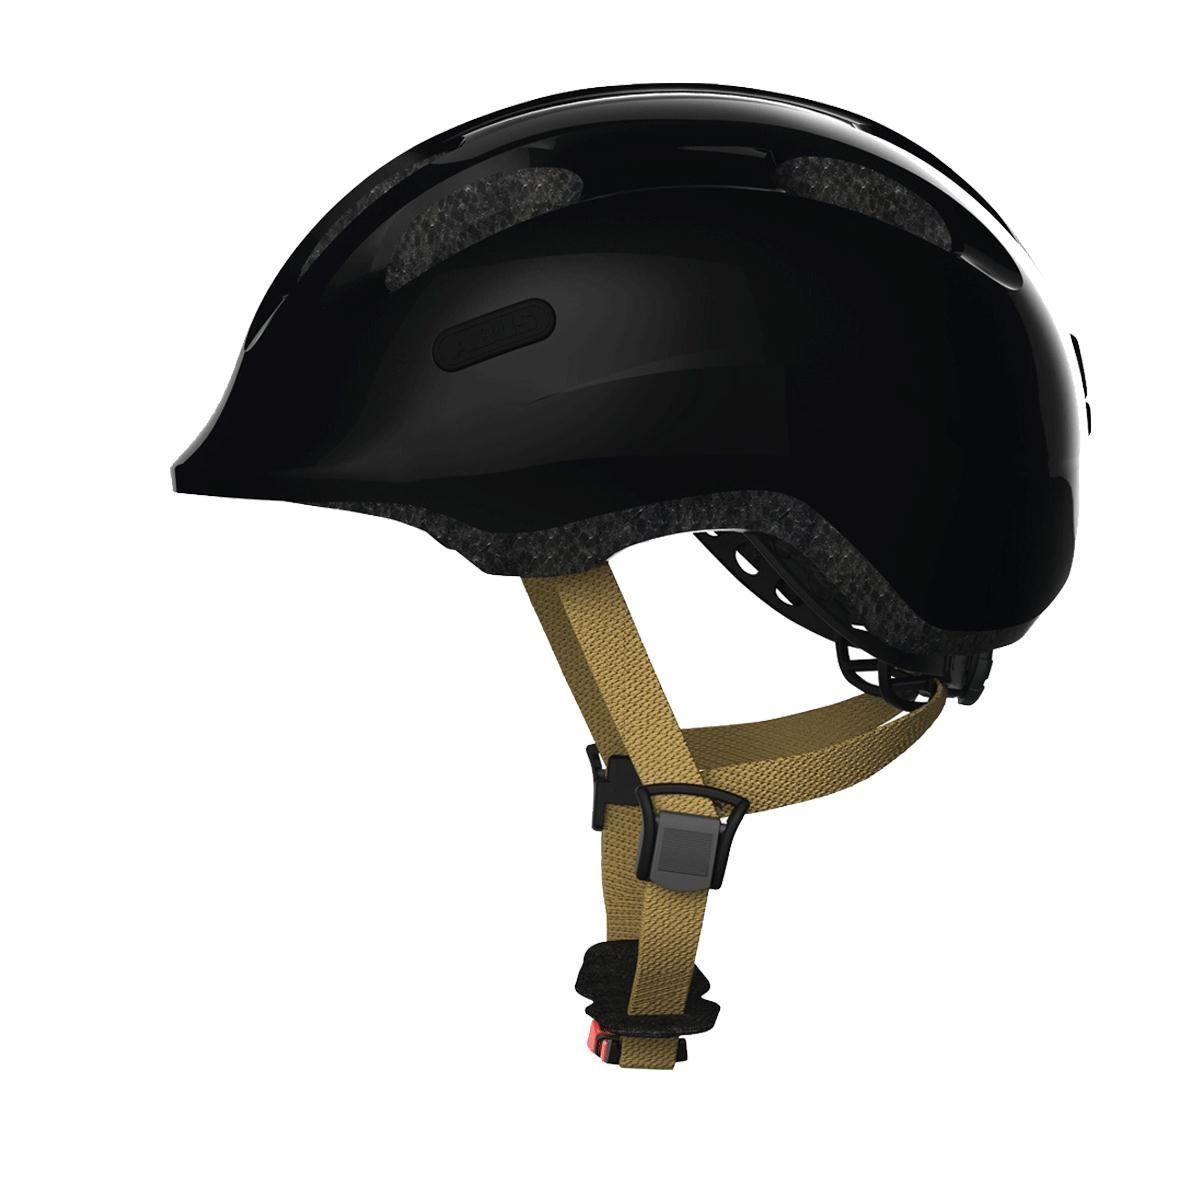 Abus Smiley 2.0 Kids Helmet: Royal Black S/M 45-50Cm